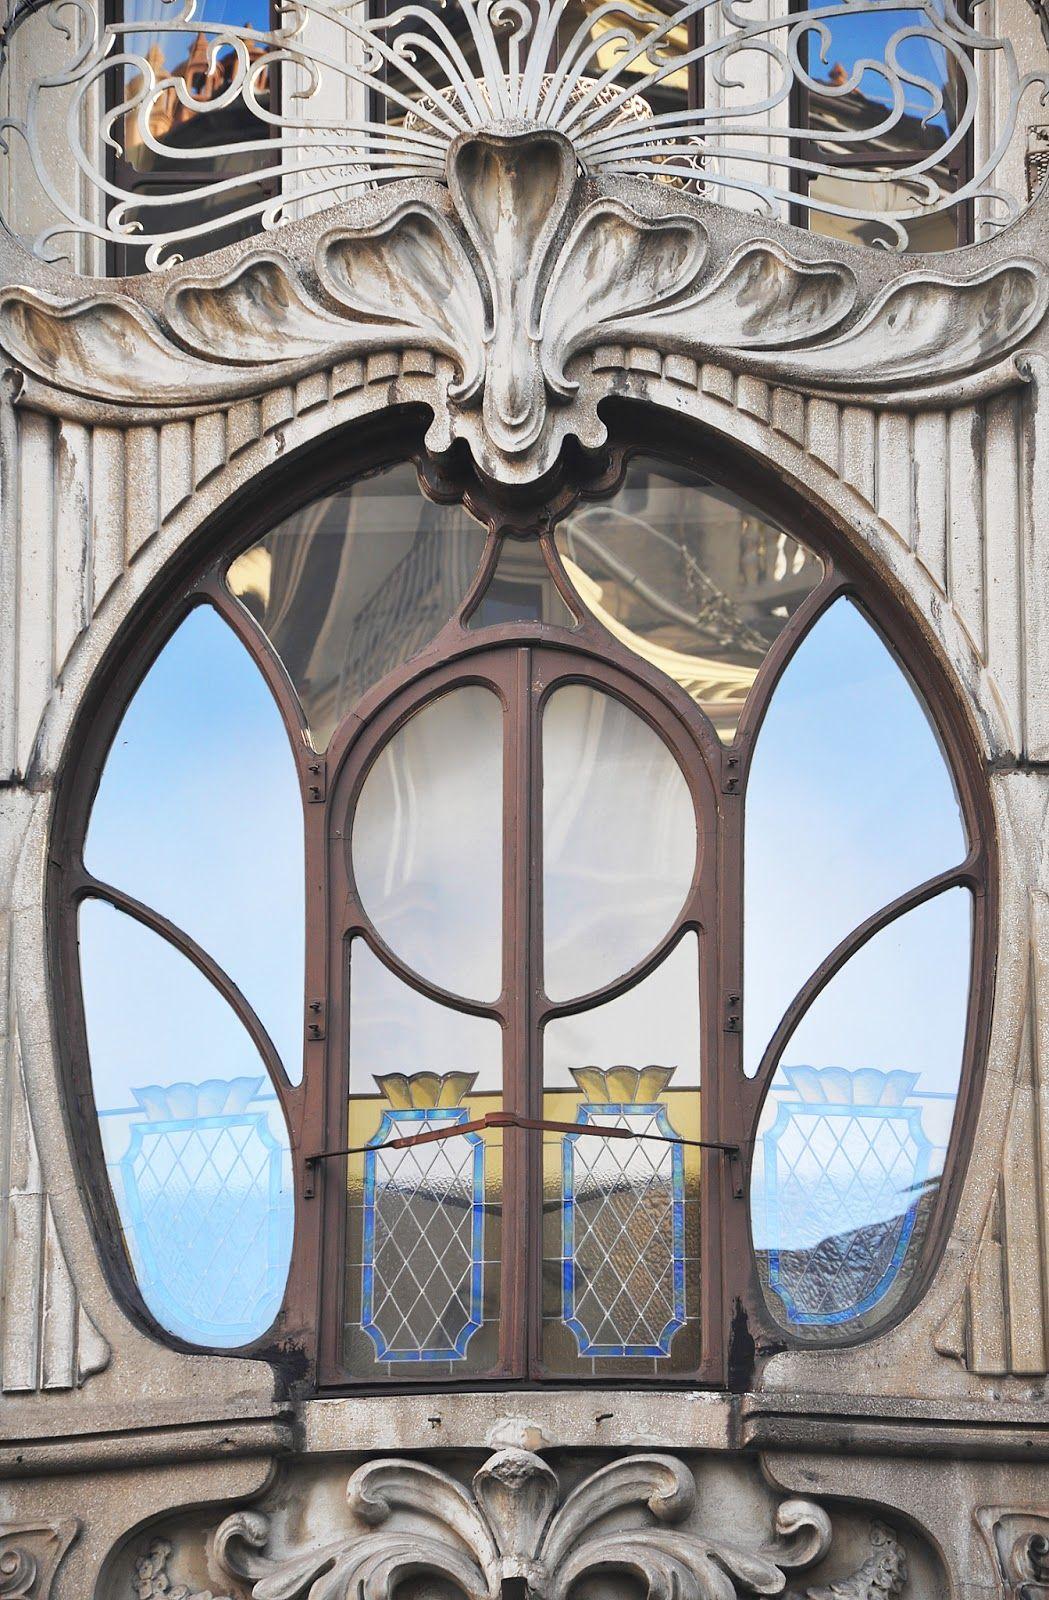 La casa florio torino artnouveau art nouveau for Casa design torino